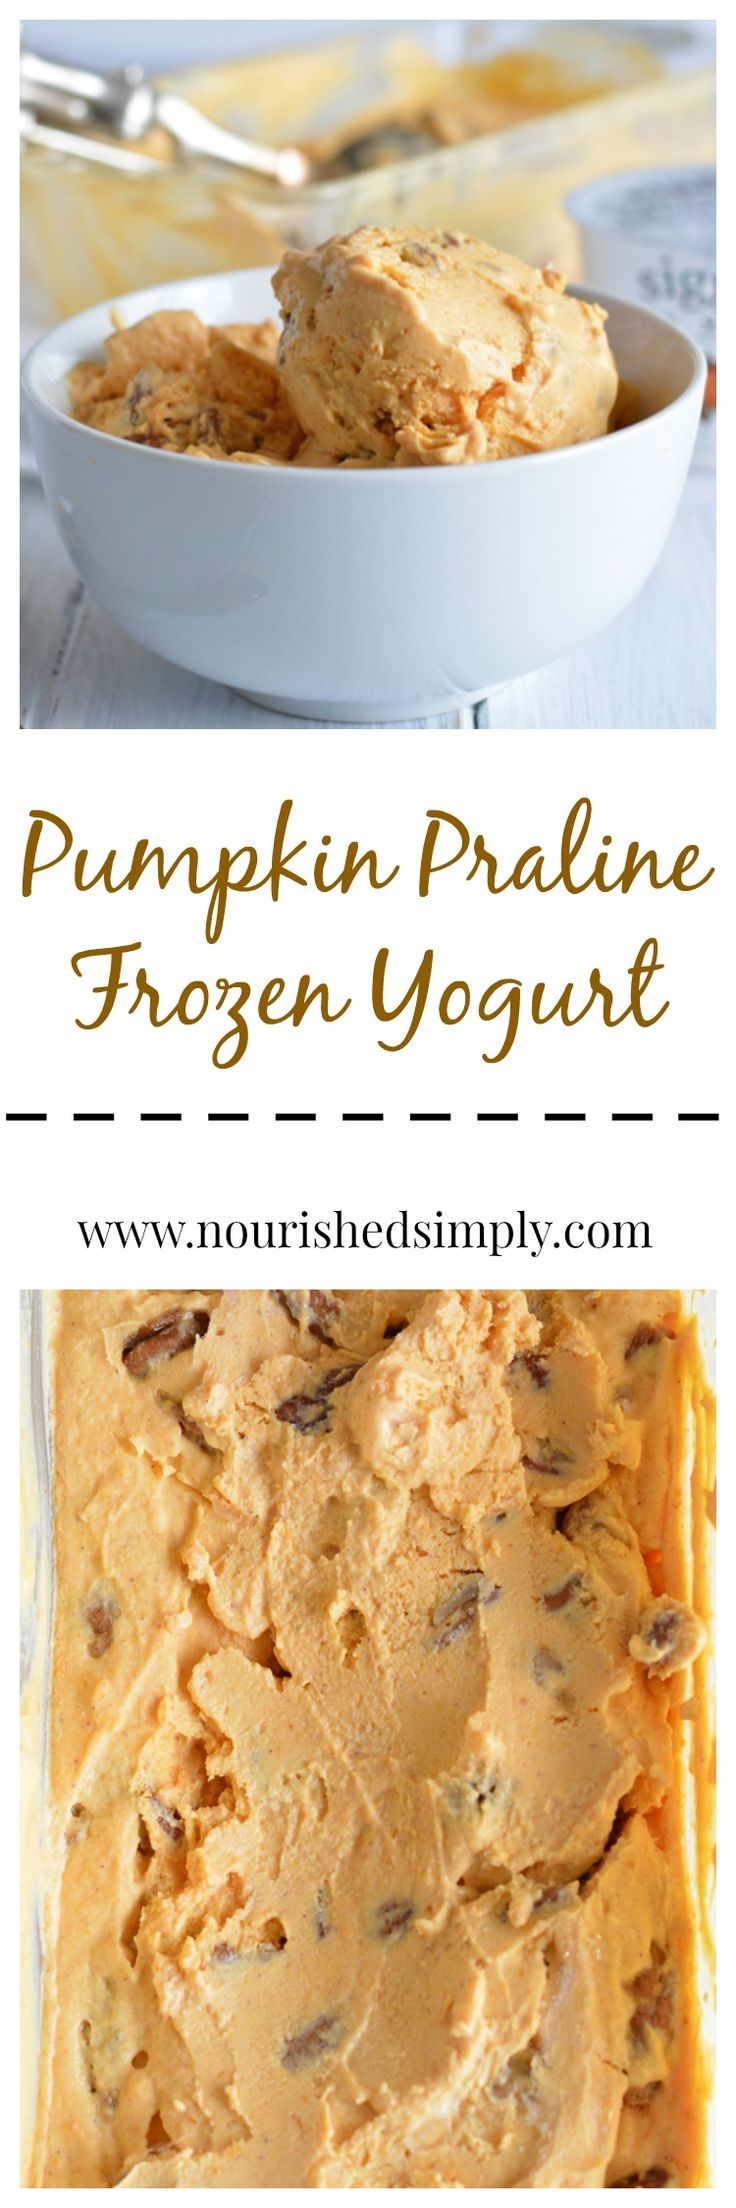 Pumpkin Praline Frozen Yogurt made with Siggi yogurt and pumpkin puree. A perfect Fall dessert.  Serve with your Thanksgiving pies.